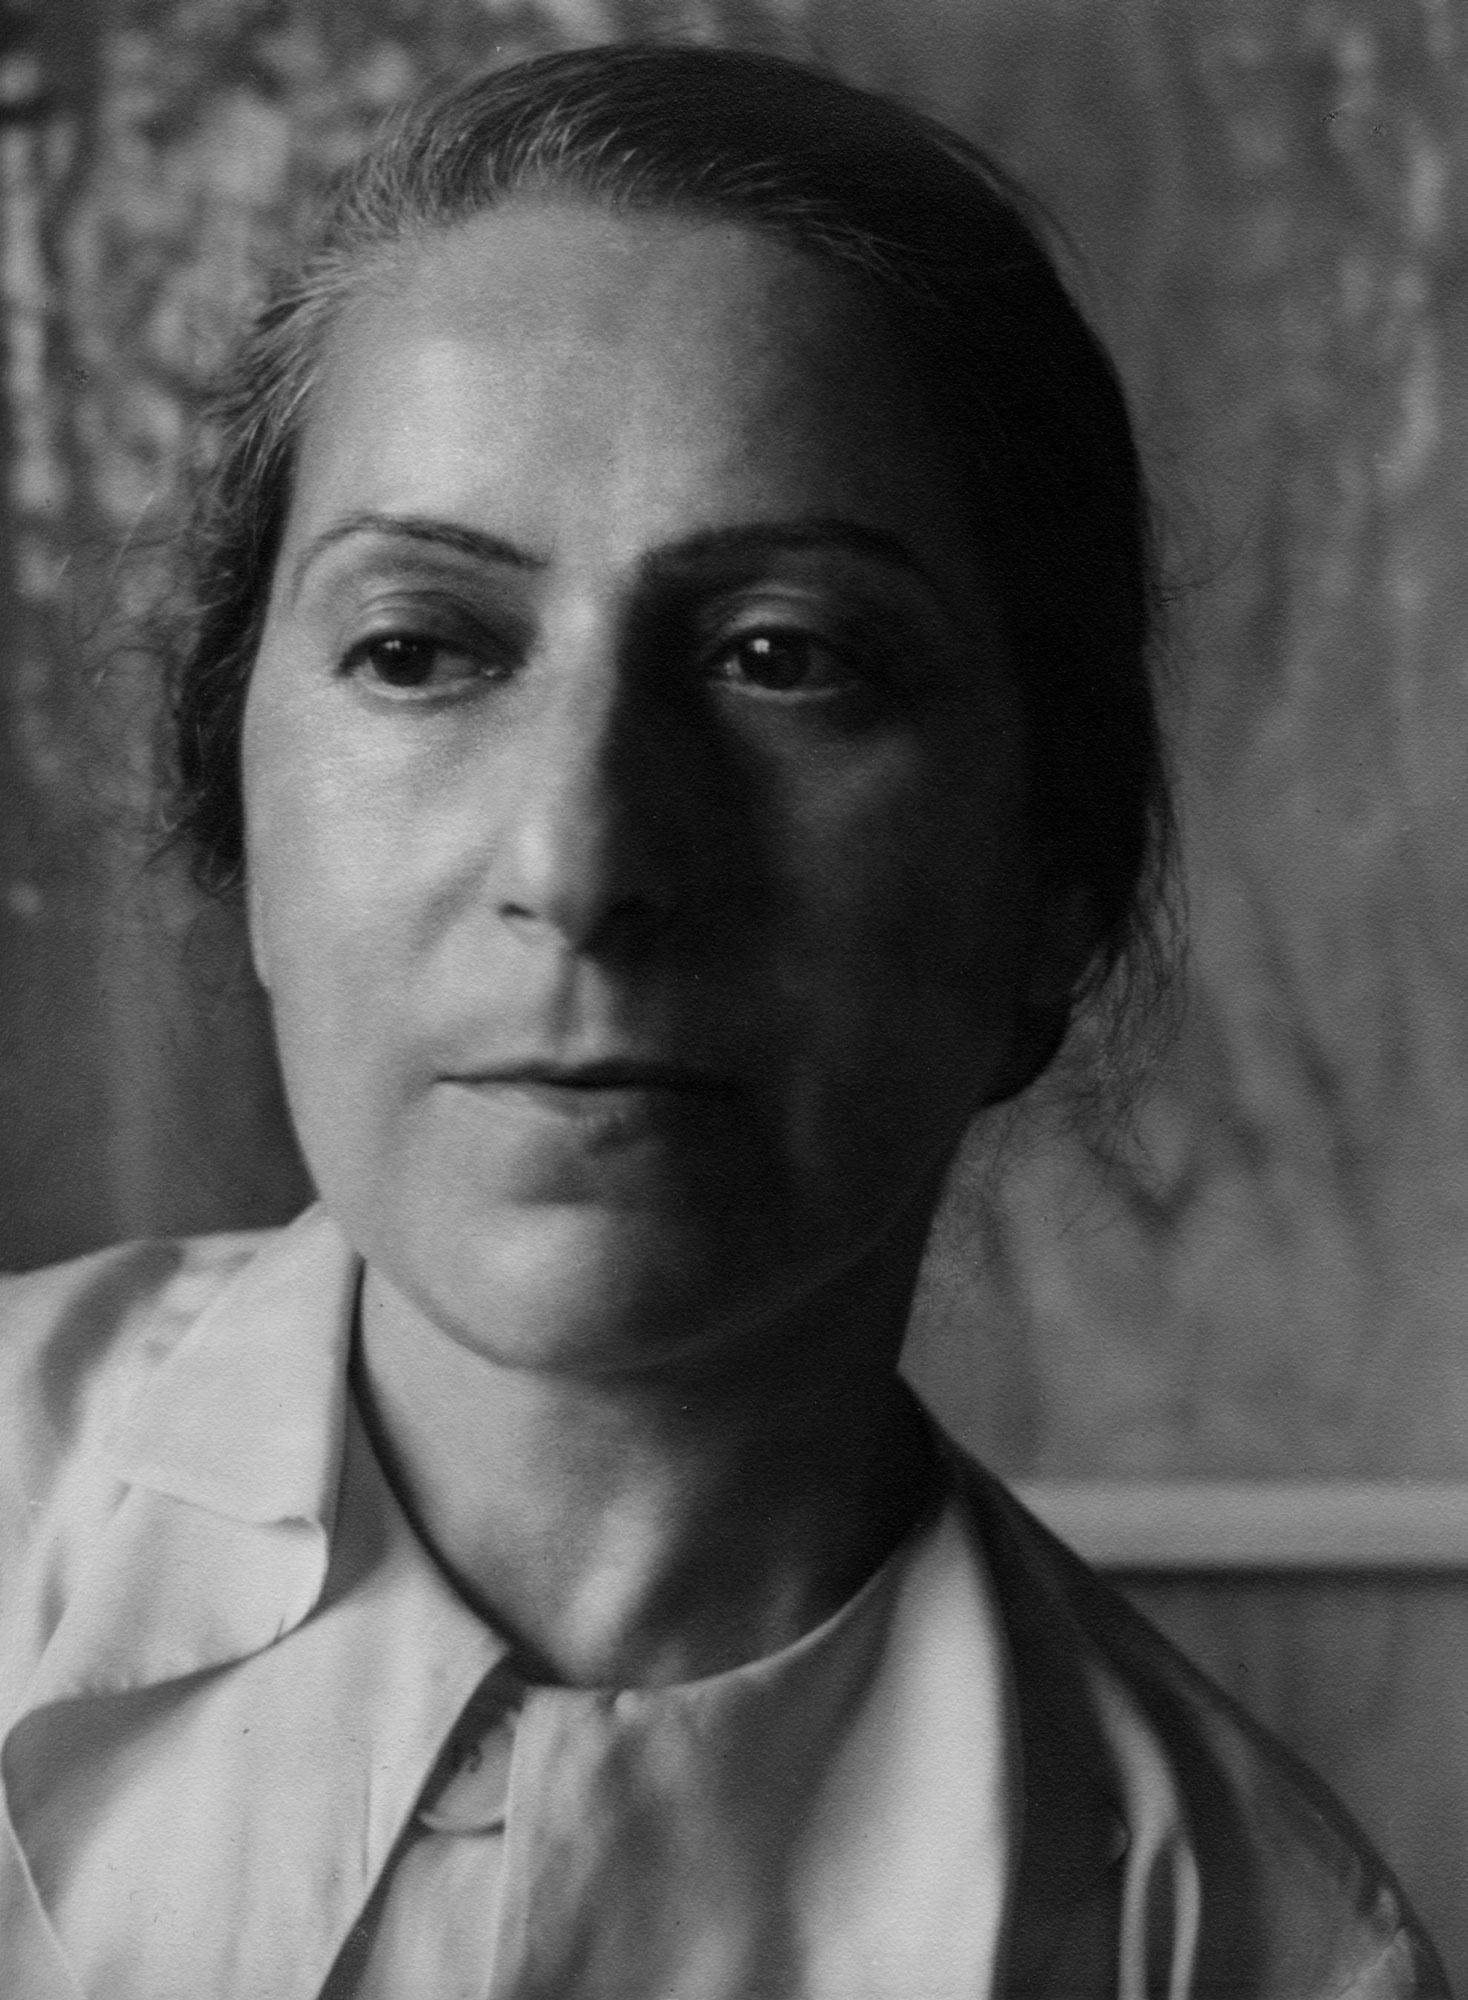 Lucy Ortlepp Anfang der 40er Jahre